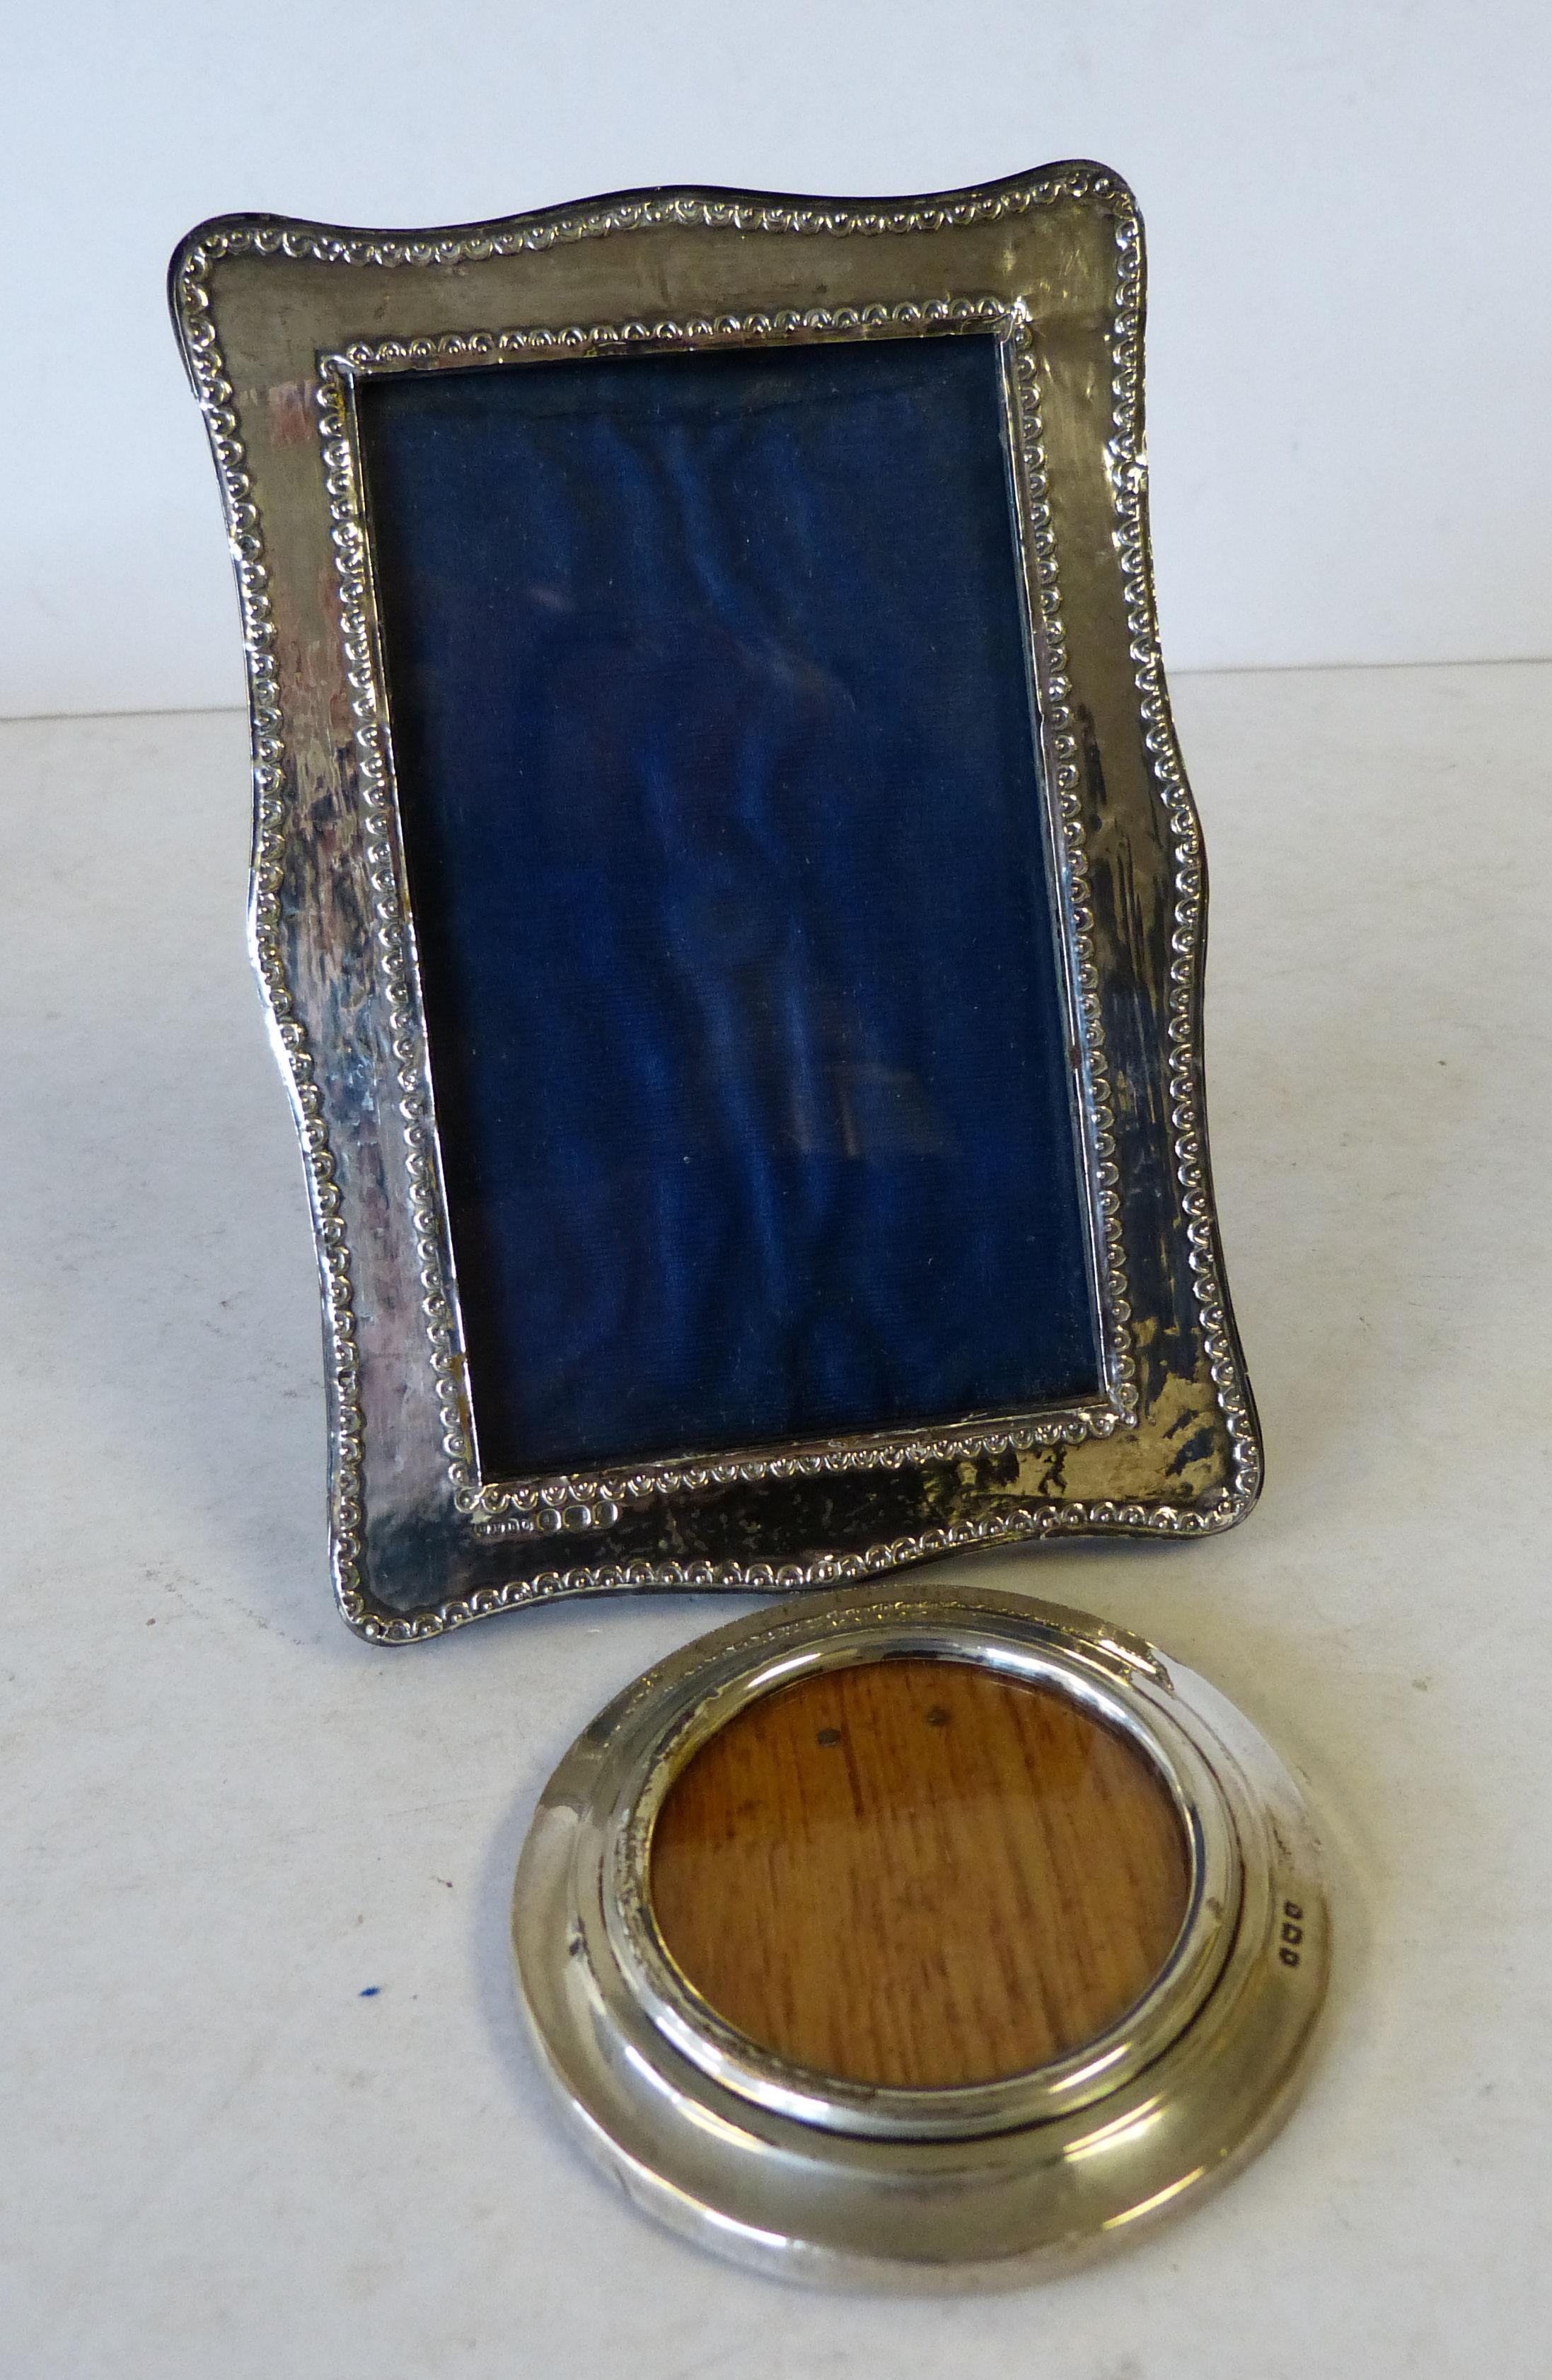 A Birmingham Silver Mounted Rectangular Scalloped Freestanding Photograph Frame